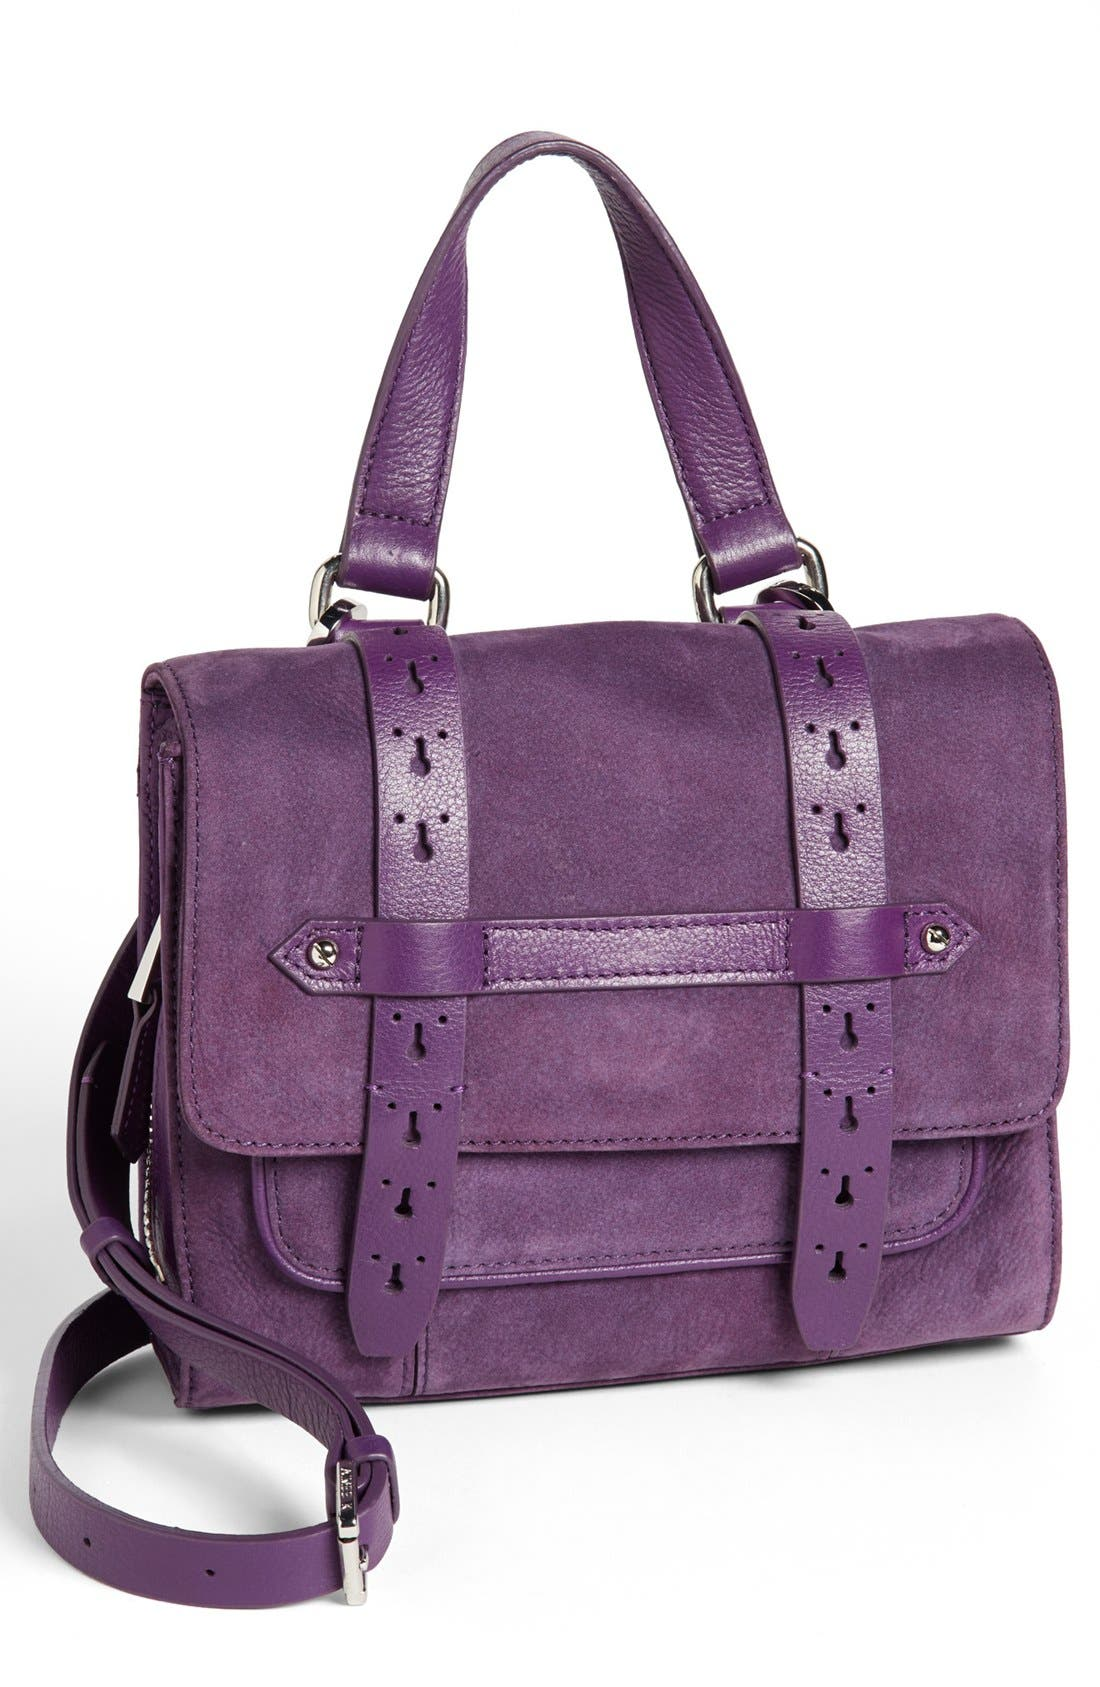 Main Image - Aimee Kestenberg 'Sammy' Crossbody Bag, Small